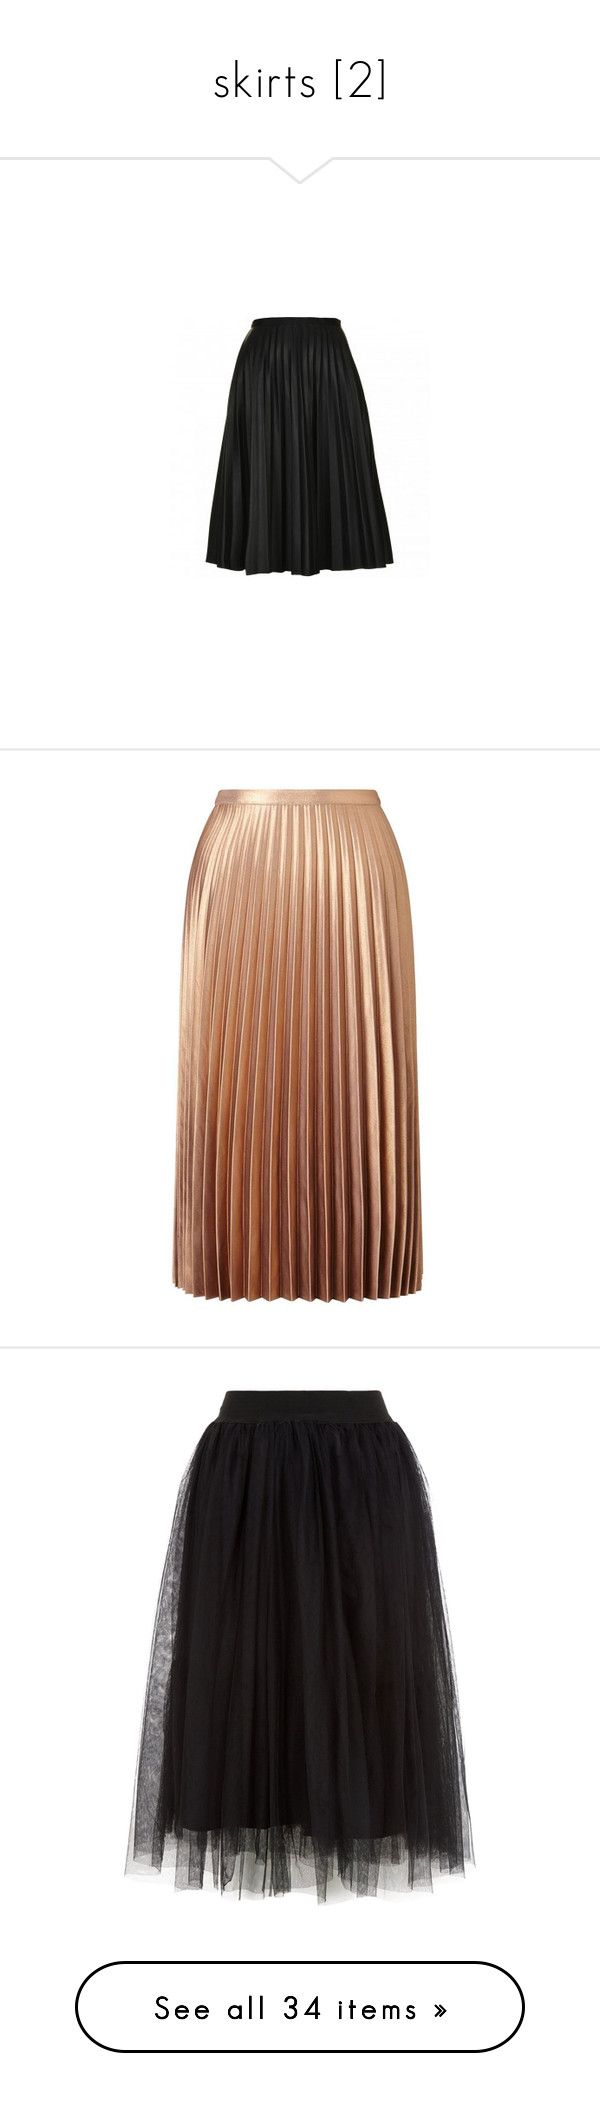 """skirts [2]"" by nikki-usmc92 ❤ liked on Polyvore featuring skirts, saia, mid calf skirts, calf length skirts, pleated skirt, topshop skirts, pleated midi skirts, bottoms, saias and metallic"